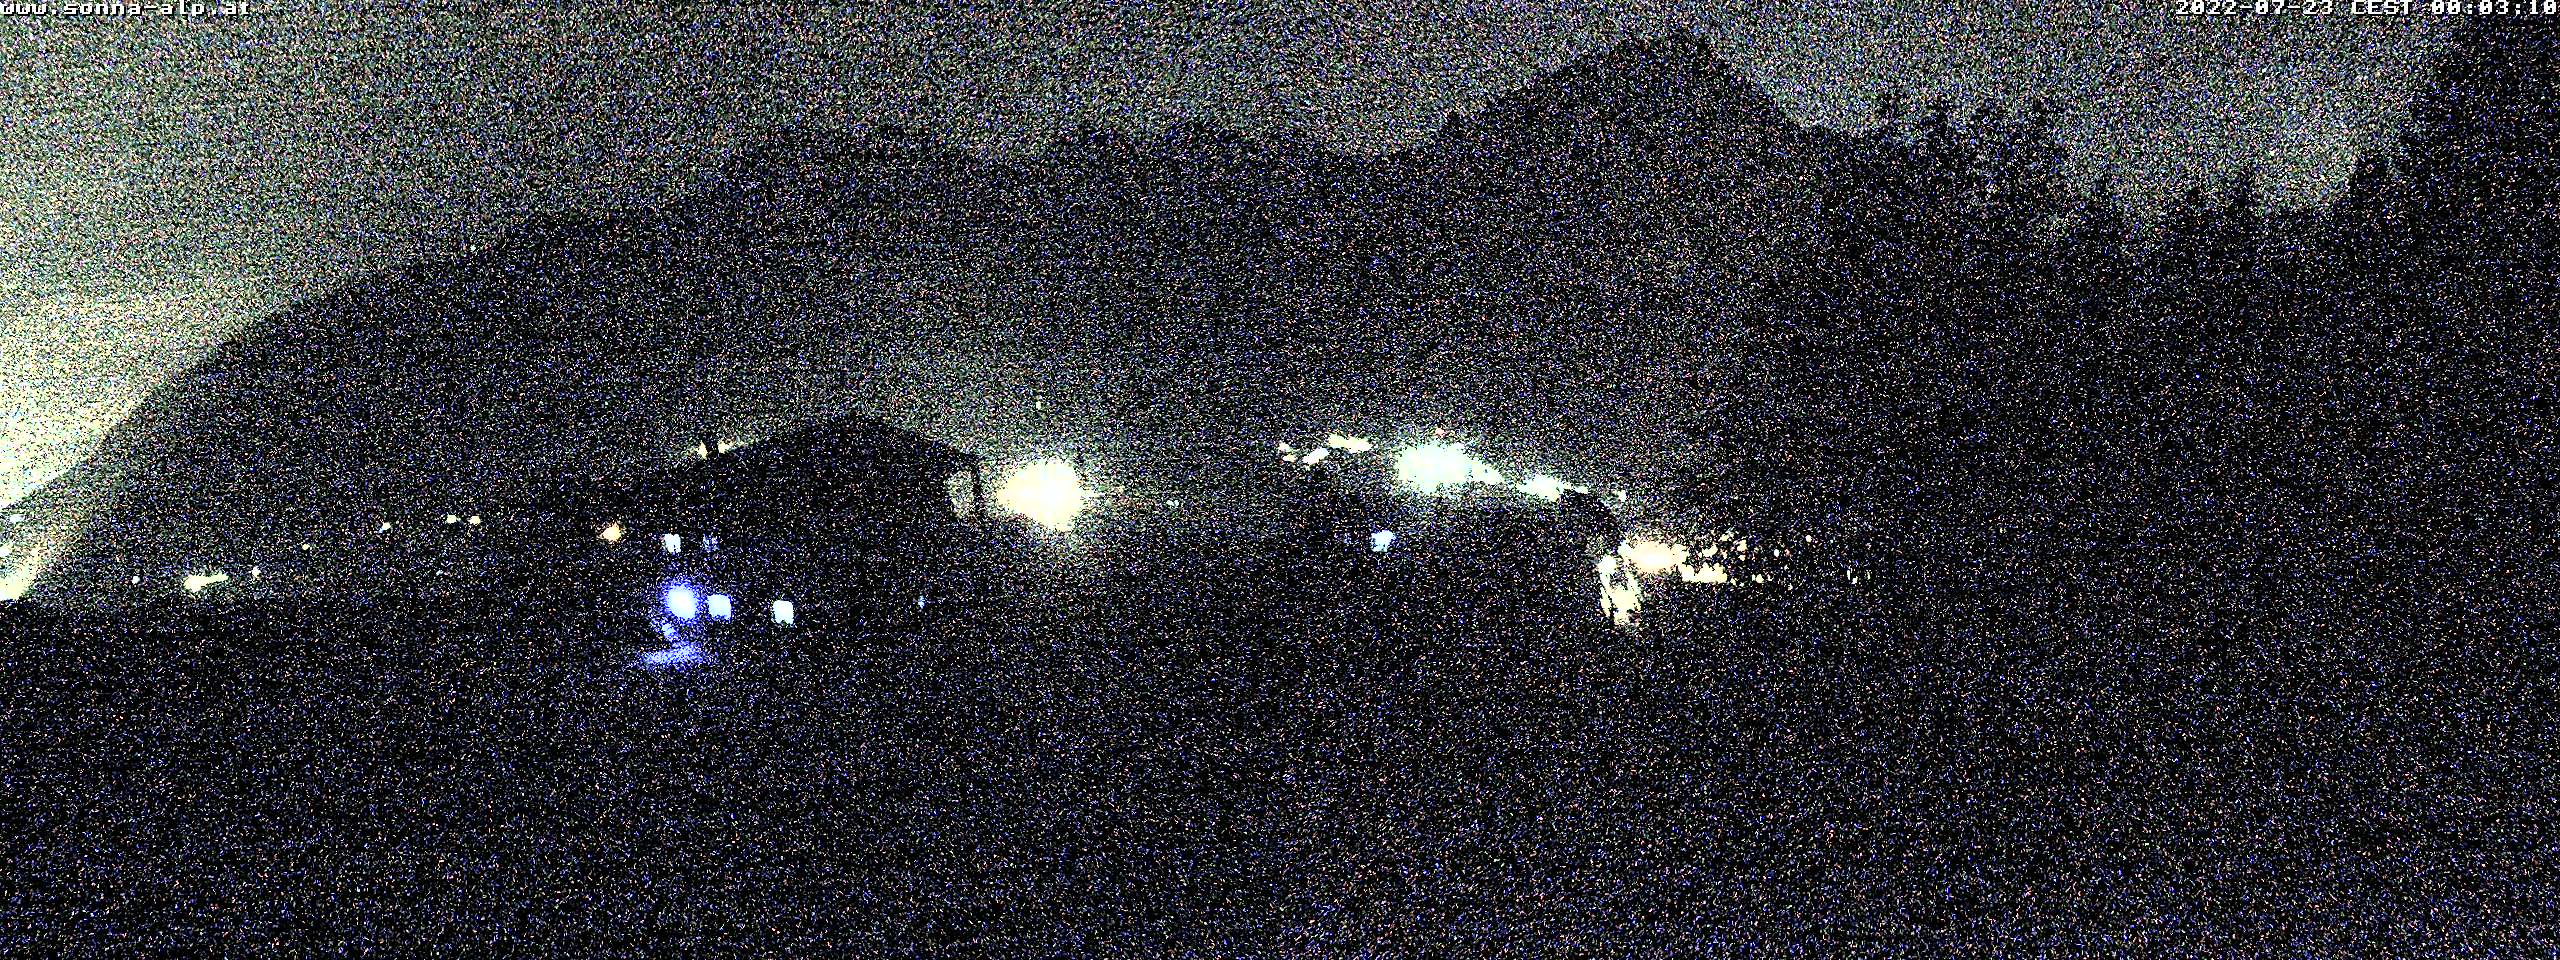 Webcam Zafernalift Bergstation im Allgäu